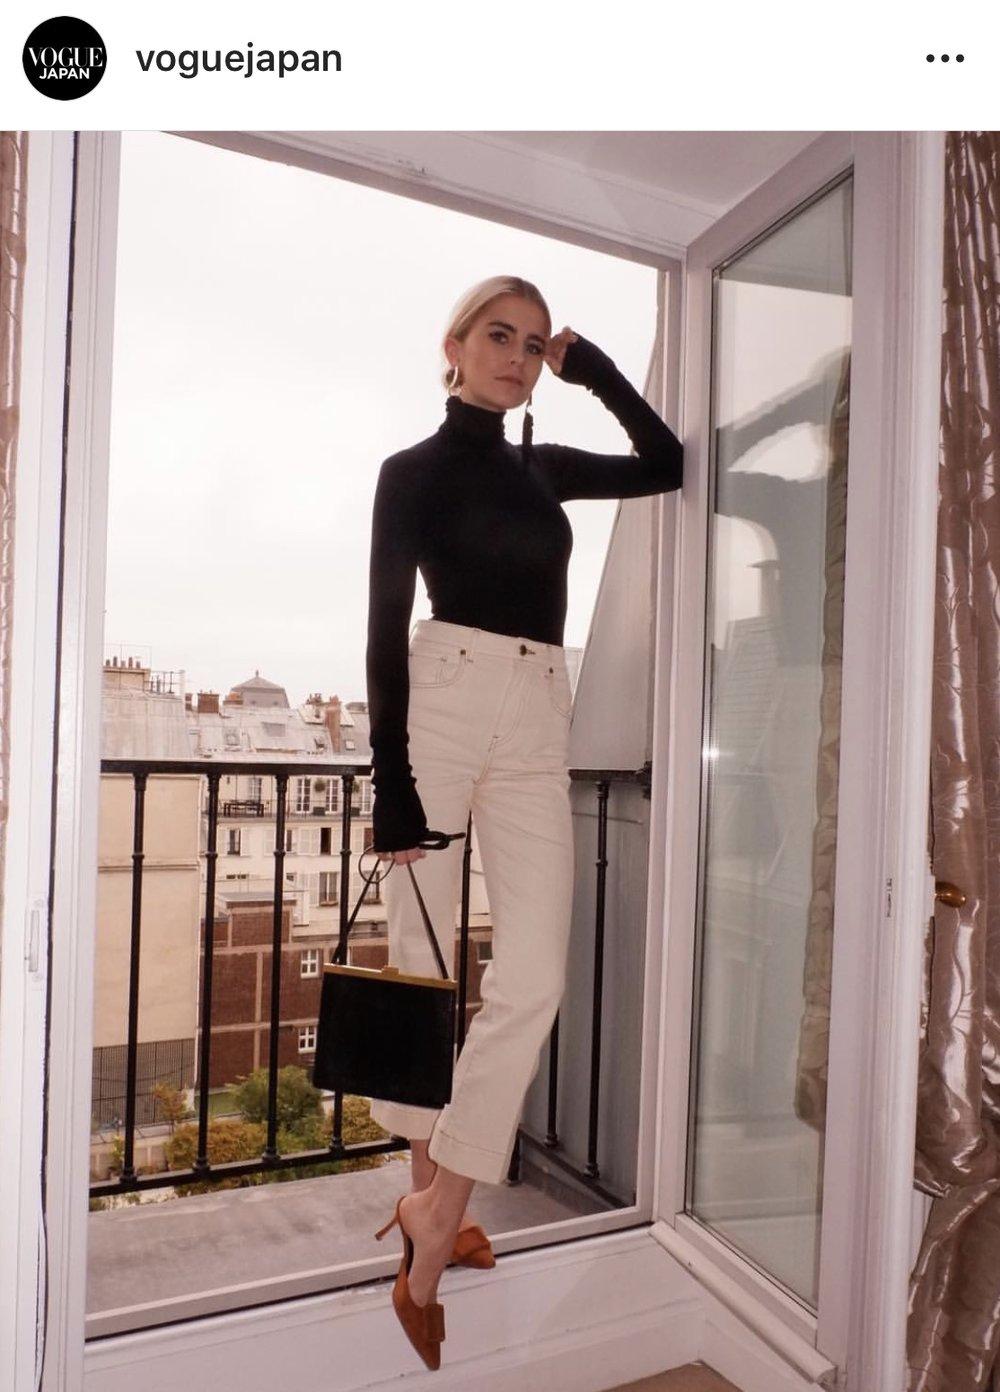 Caro Daur in Vogue Japan wearing Khaite Jeans